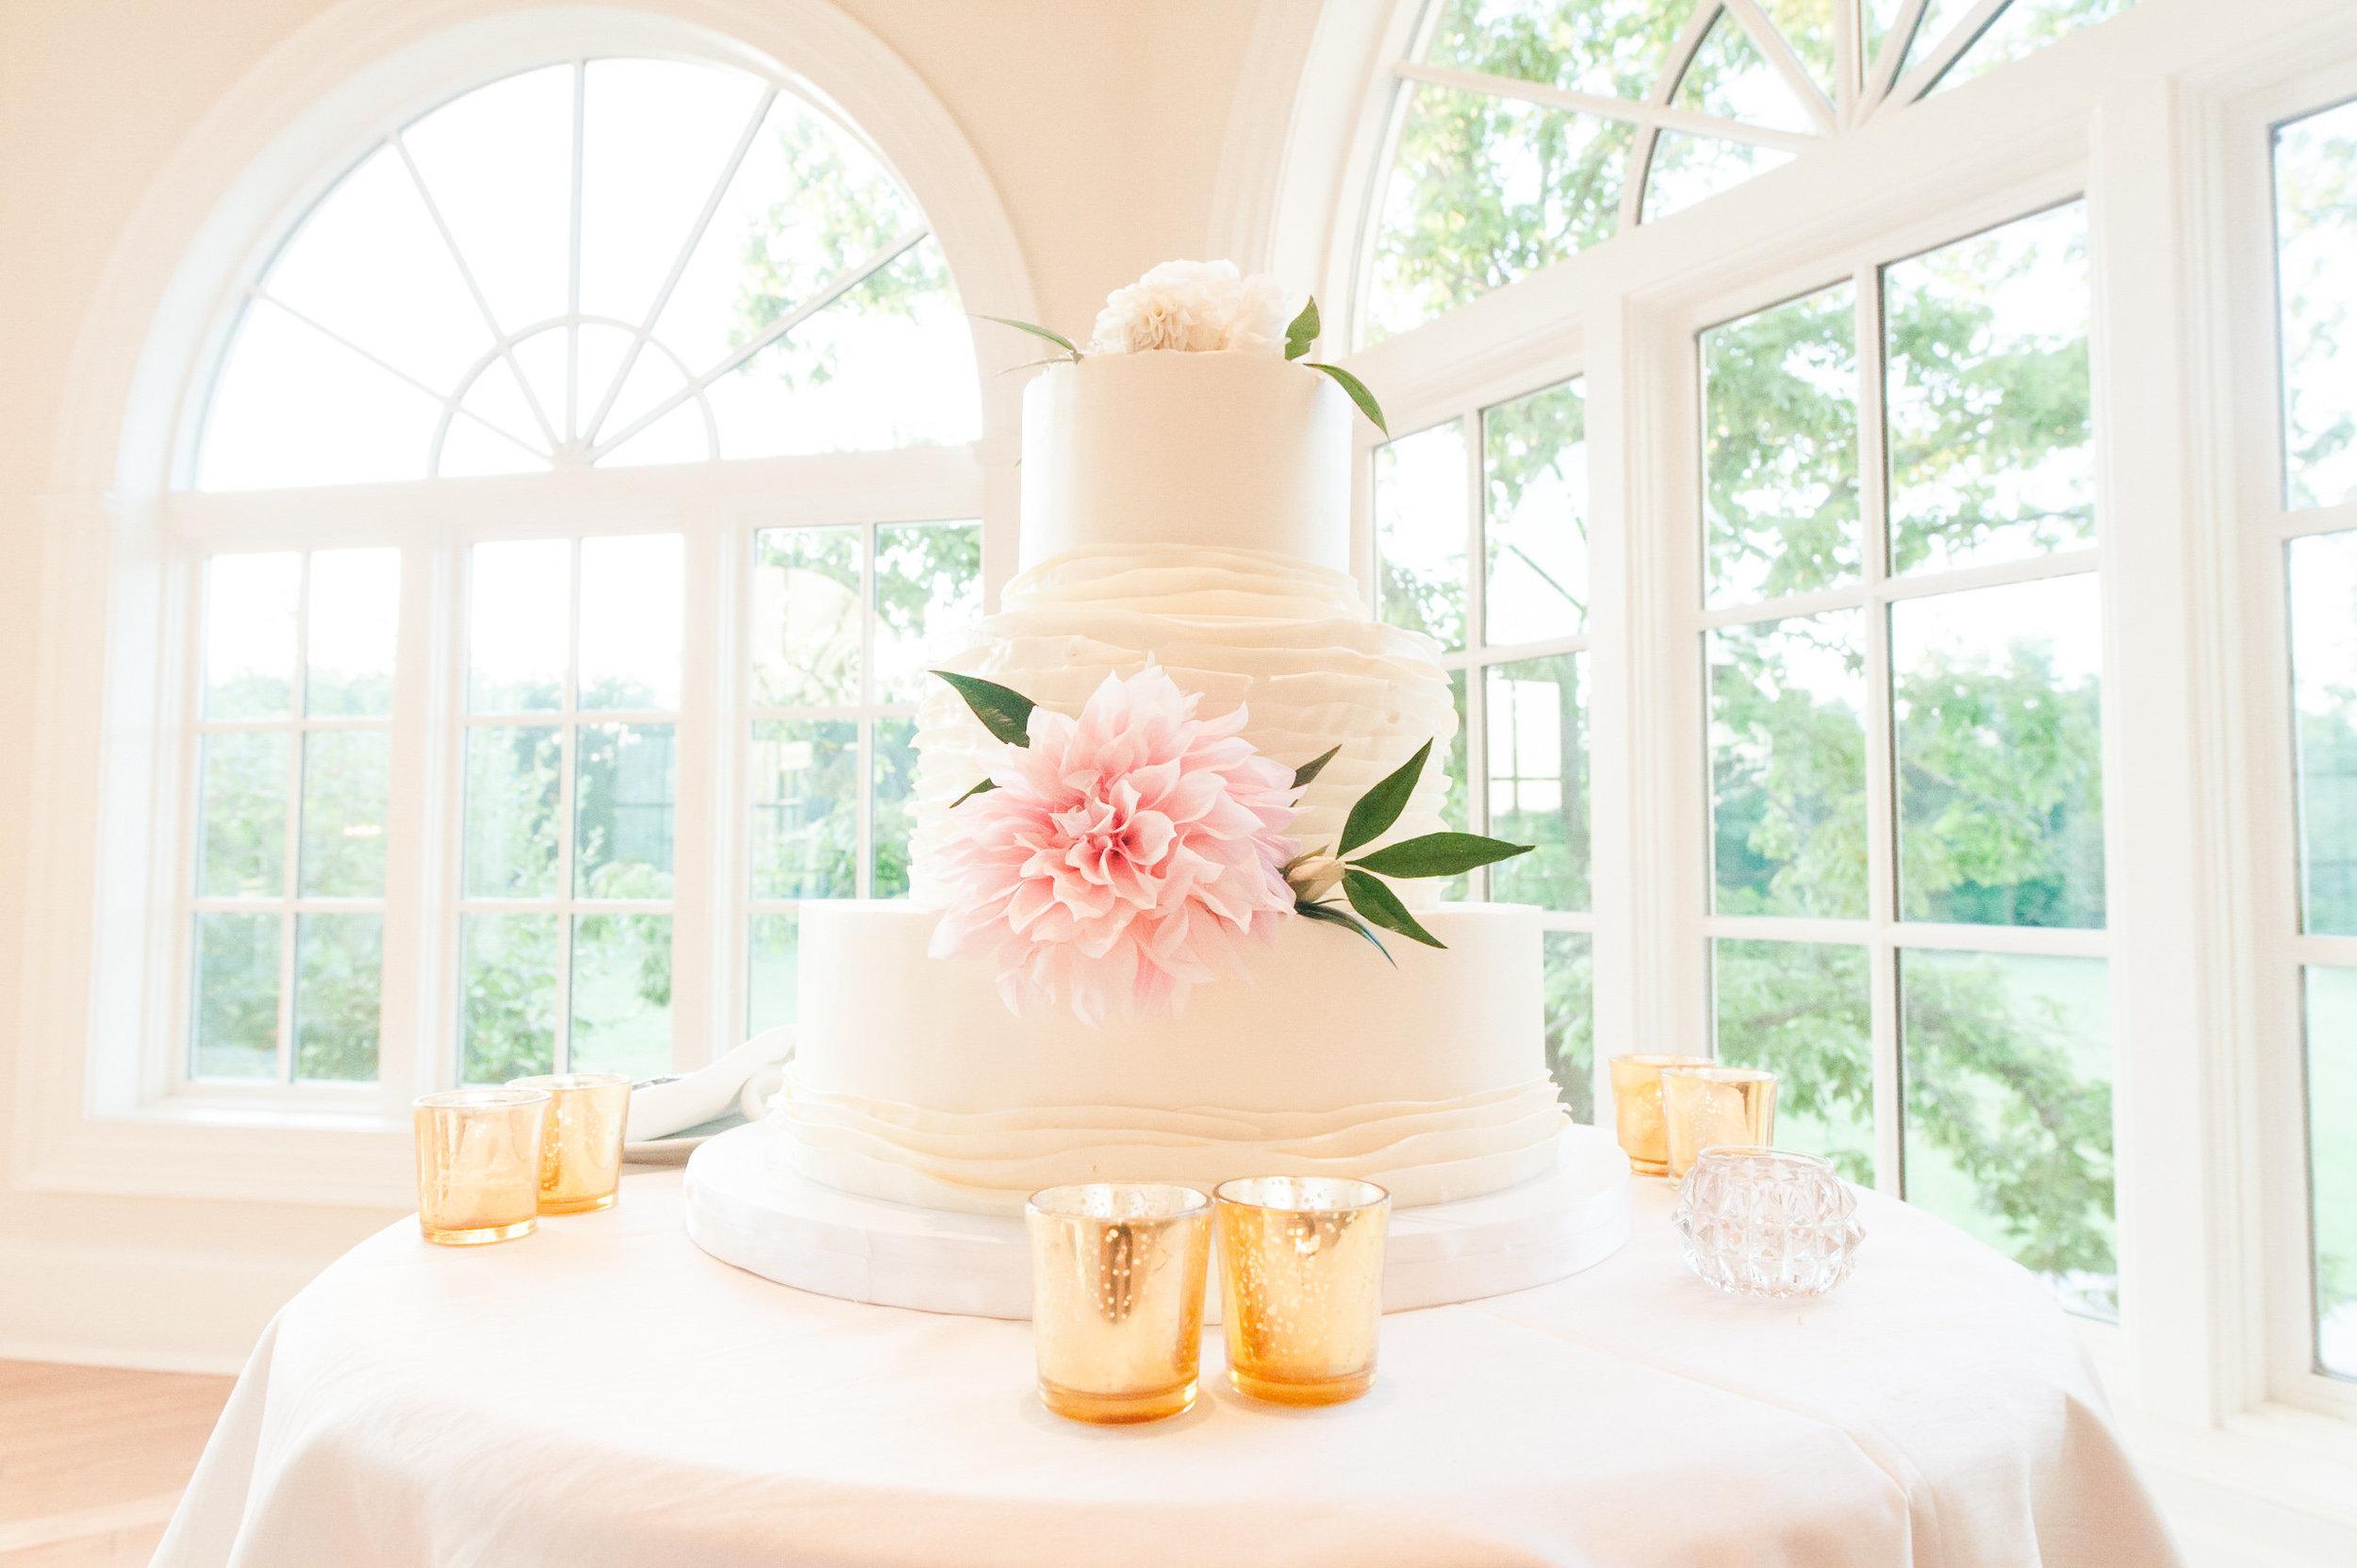 MORAIS VINEYARDS WEDDING A BEYOUTIFUL FETE EVENTS & DESIGN  - VIRGINIA AND DC WEDDING PLANNER 13.jpg